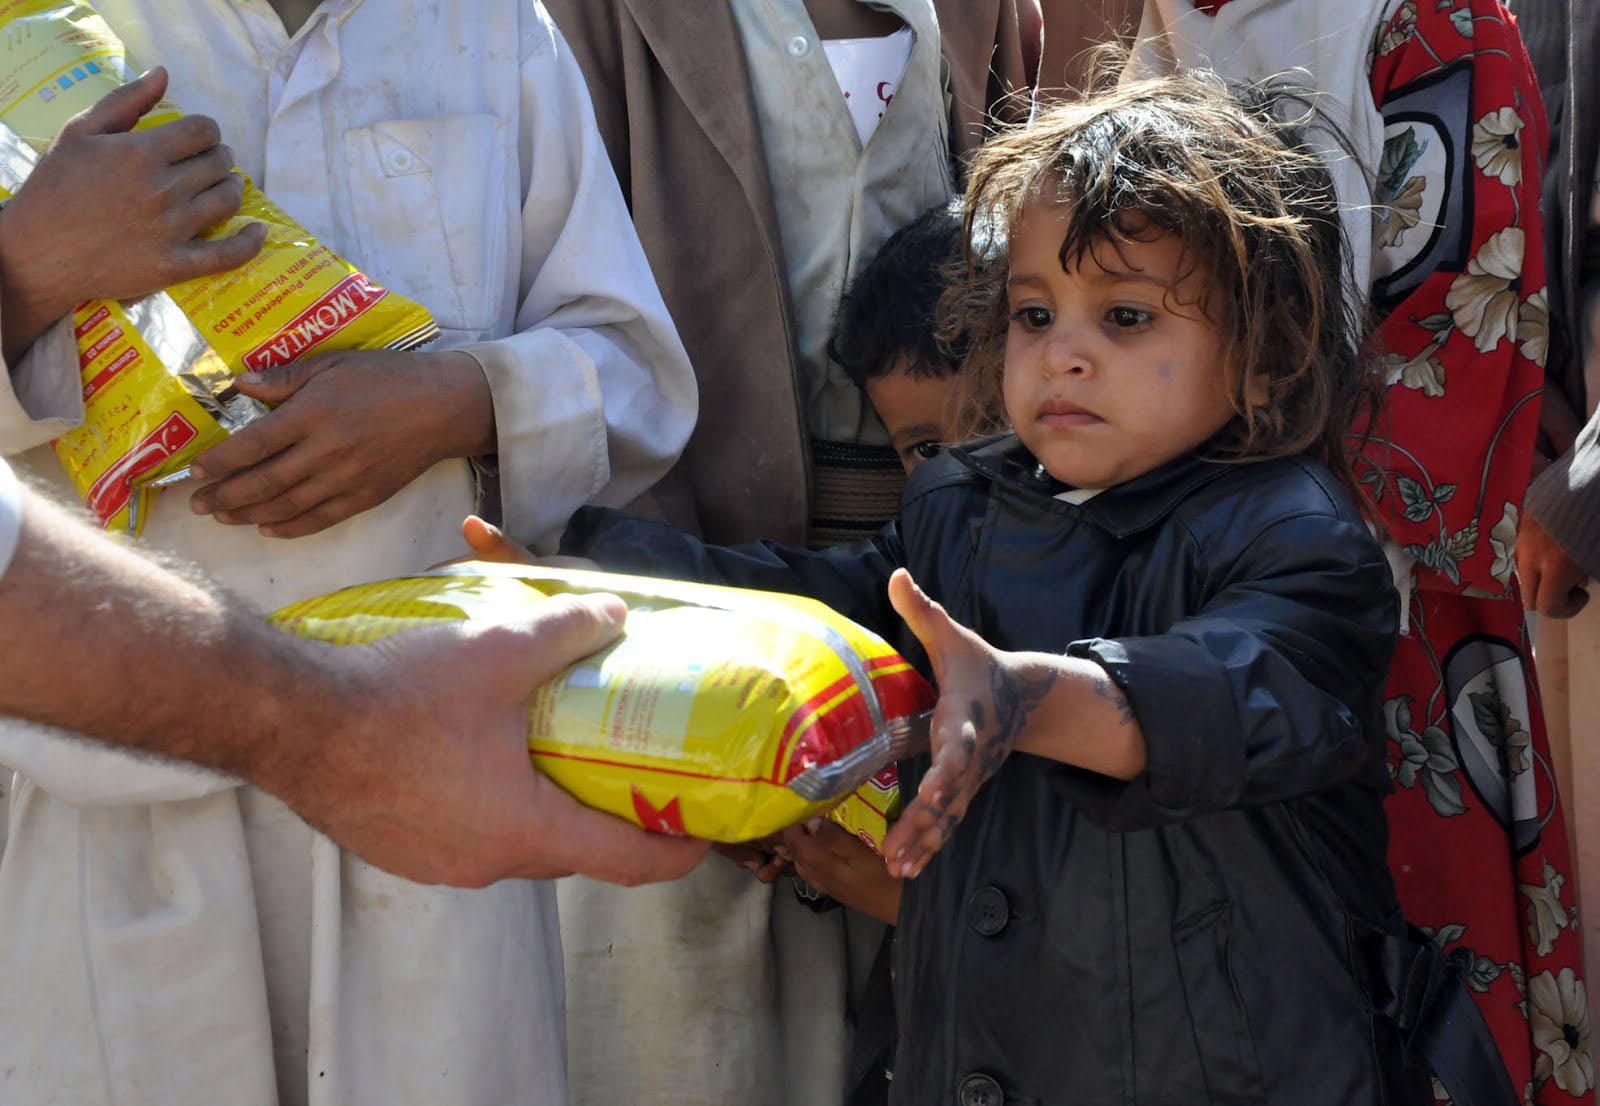 ihh-yemen-acil-yardim-kampanyasi-4.jpg